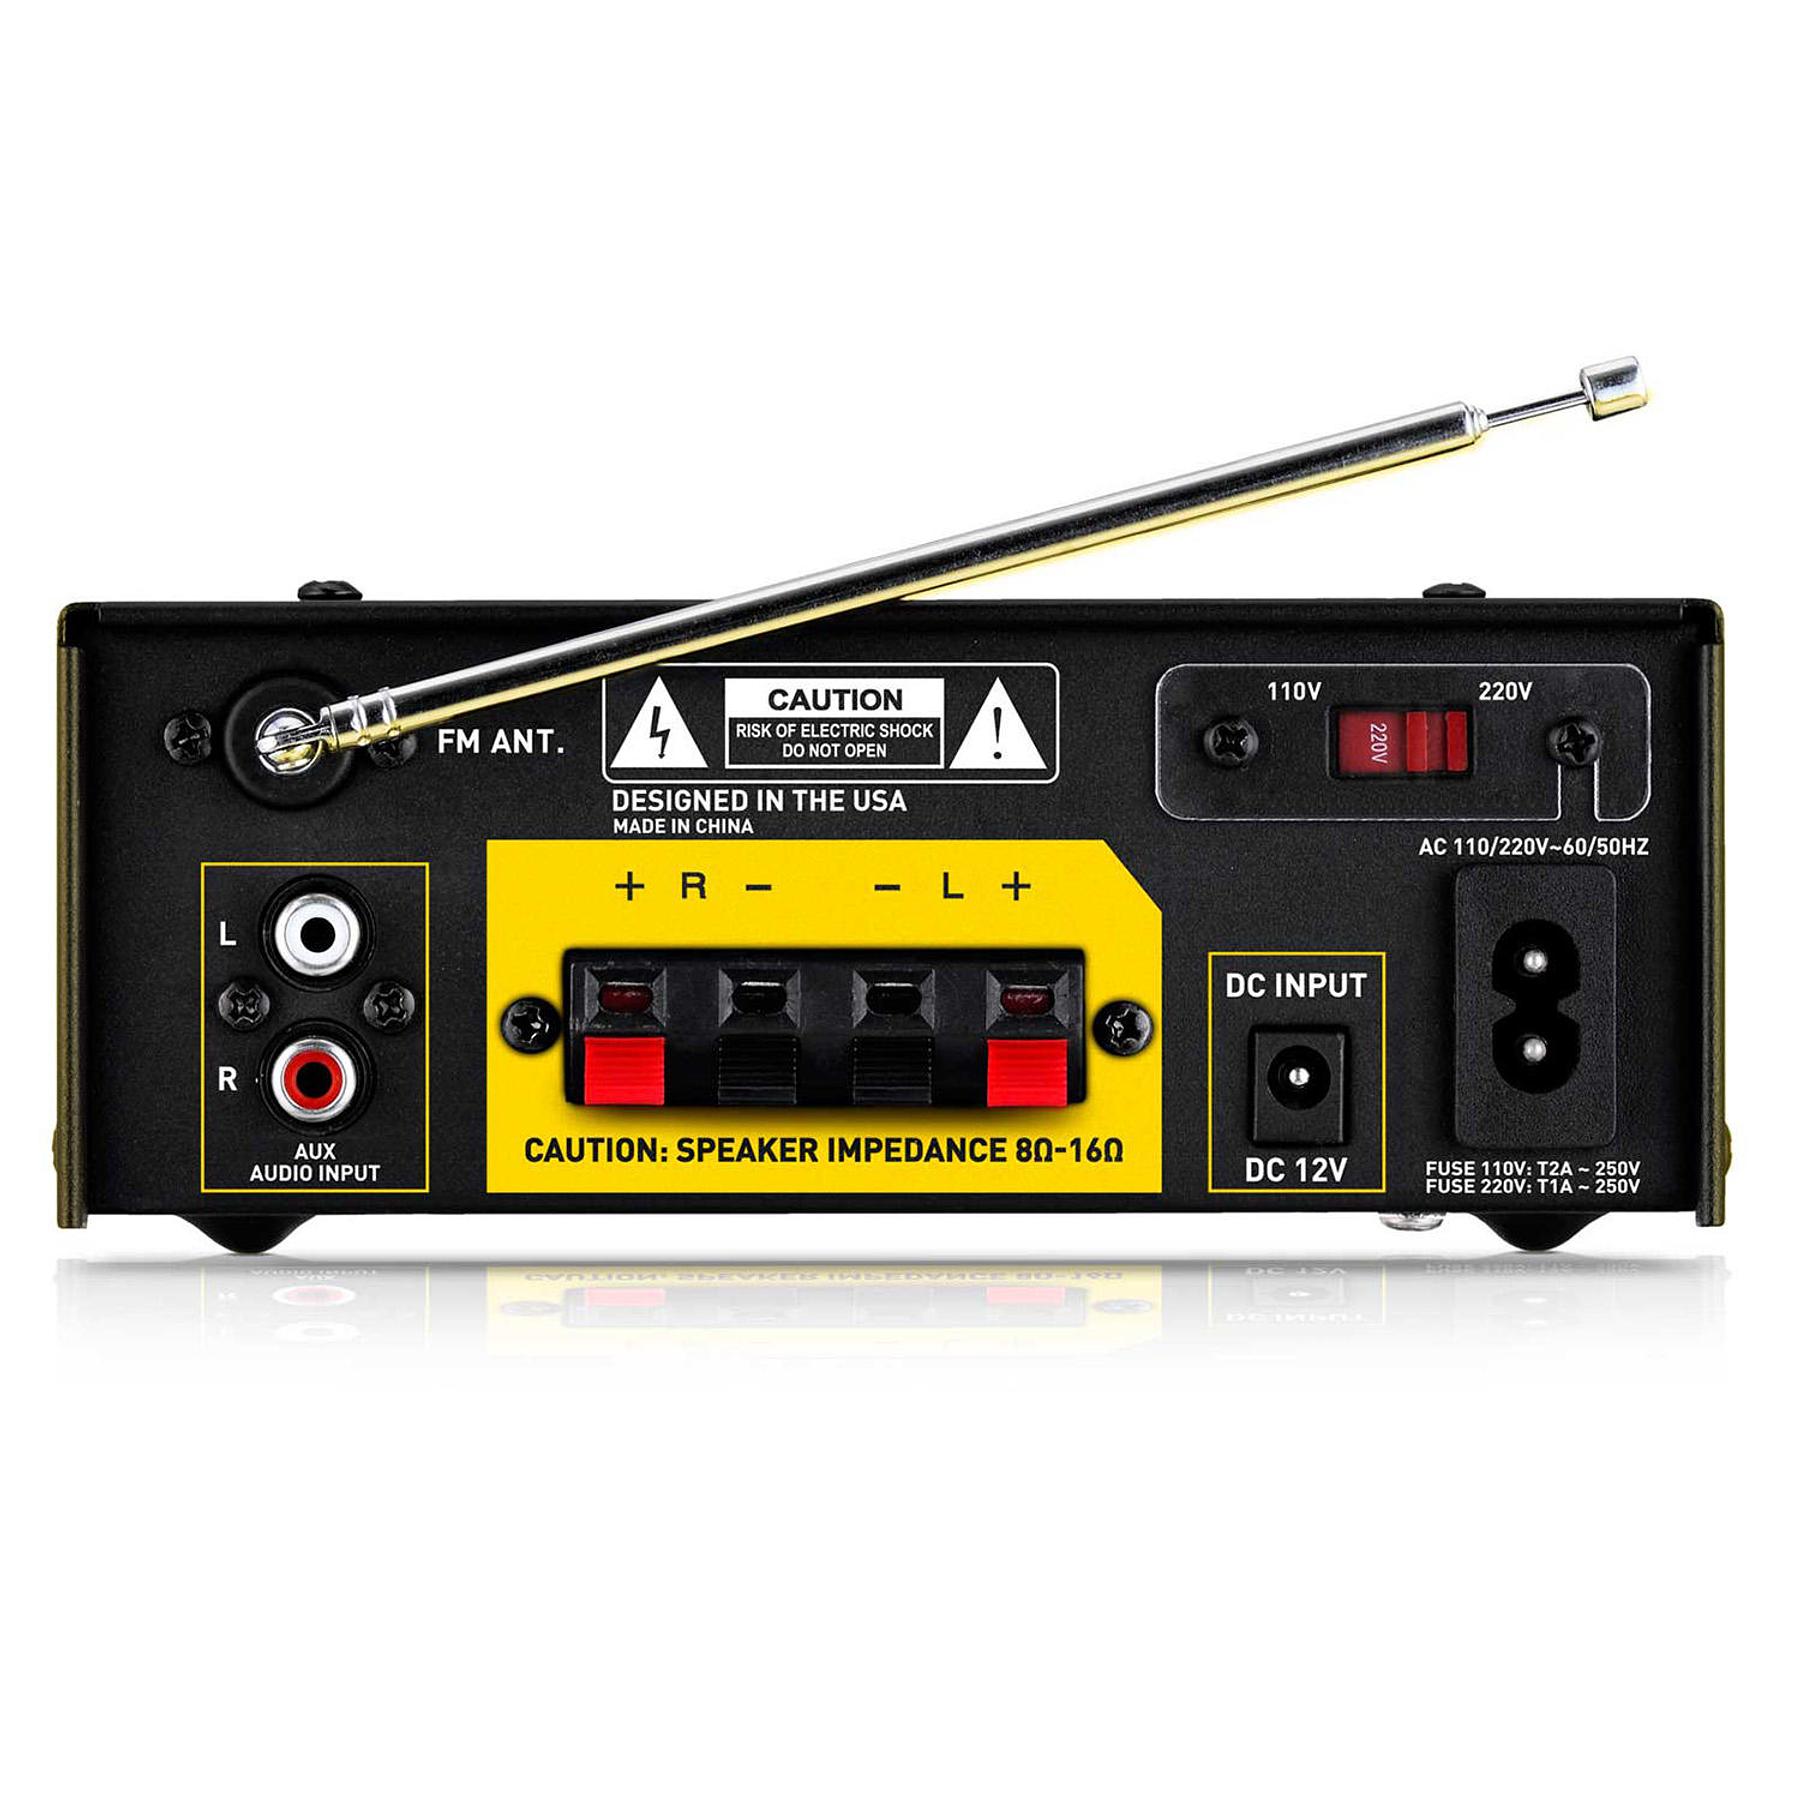 Amplificador para perifoneo SKP PW-045BT